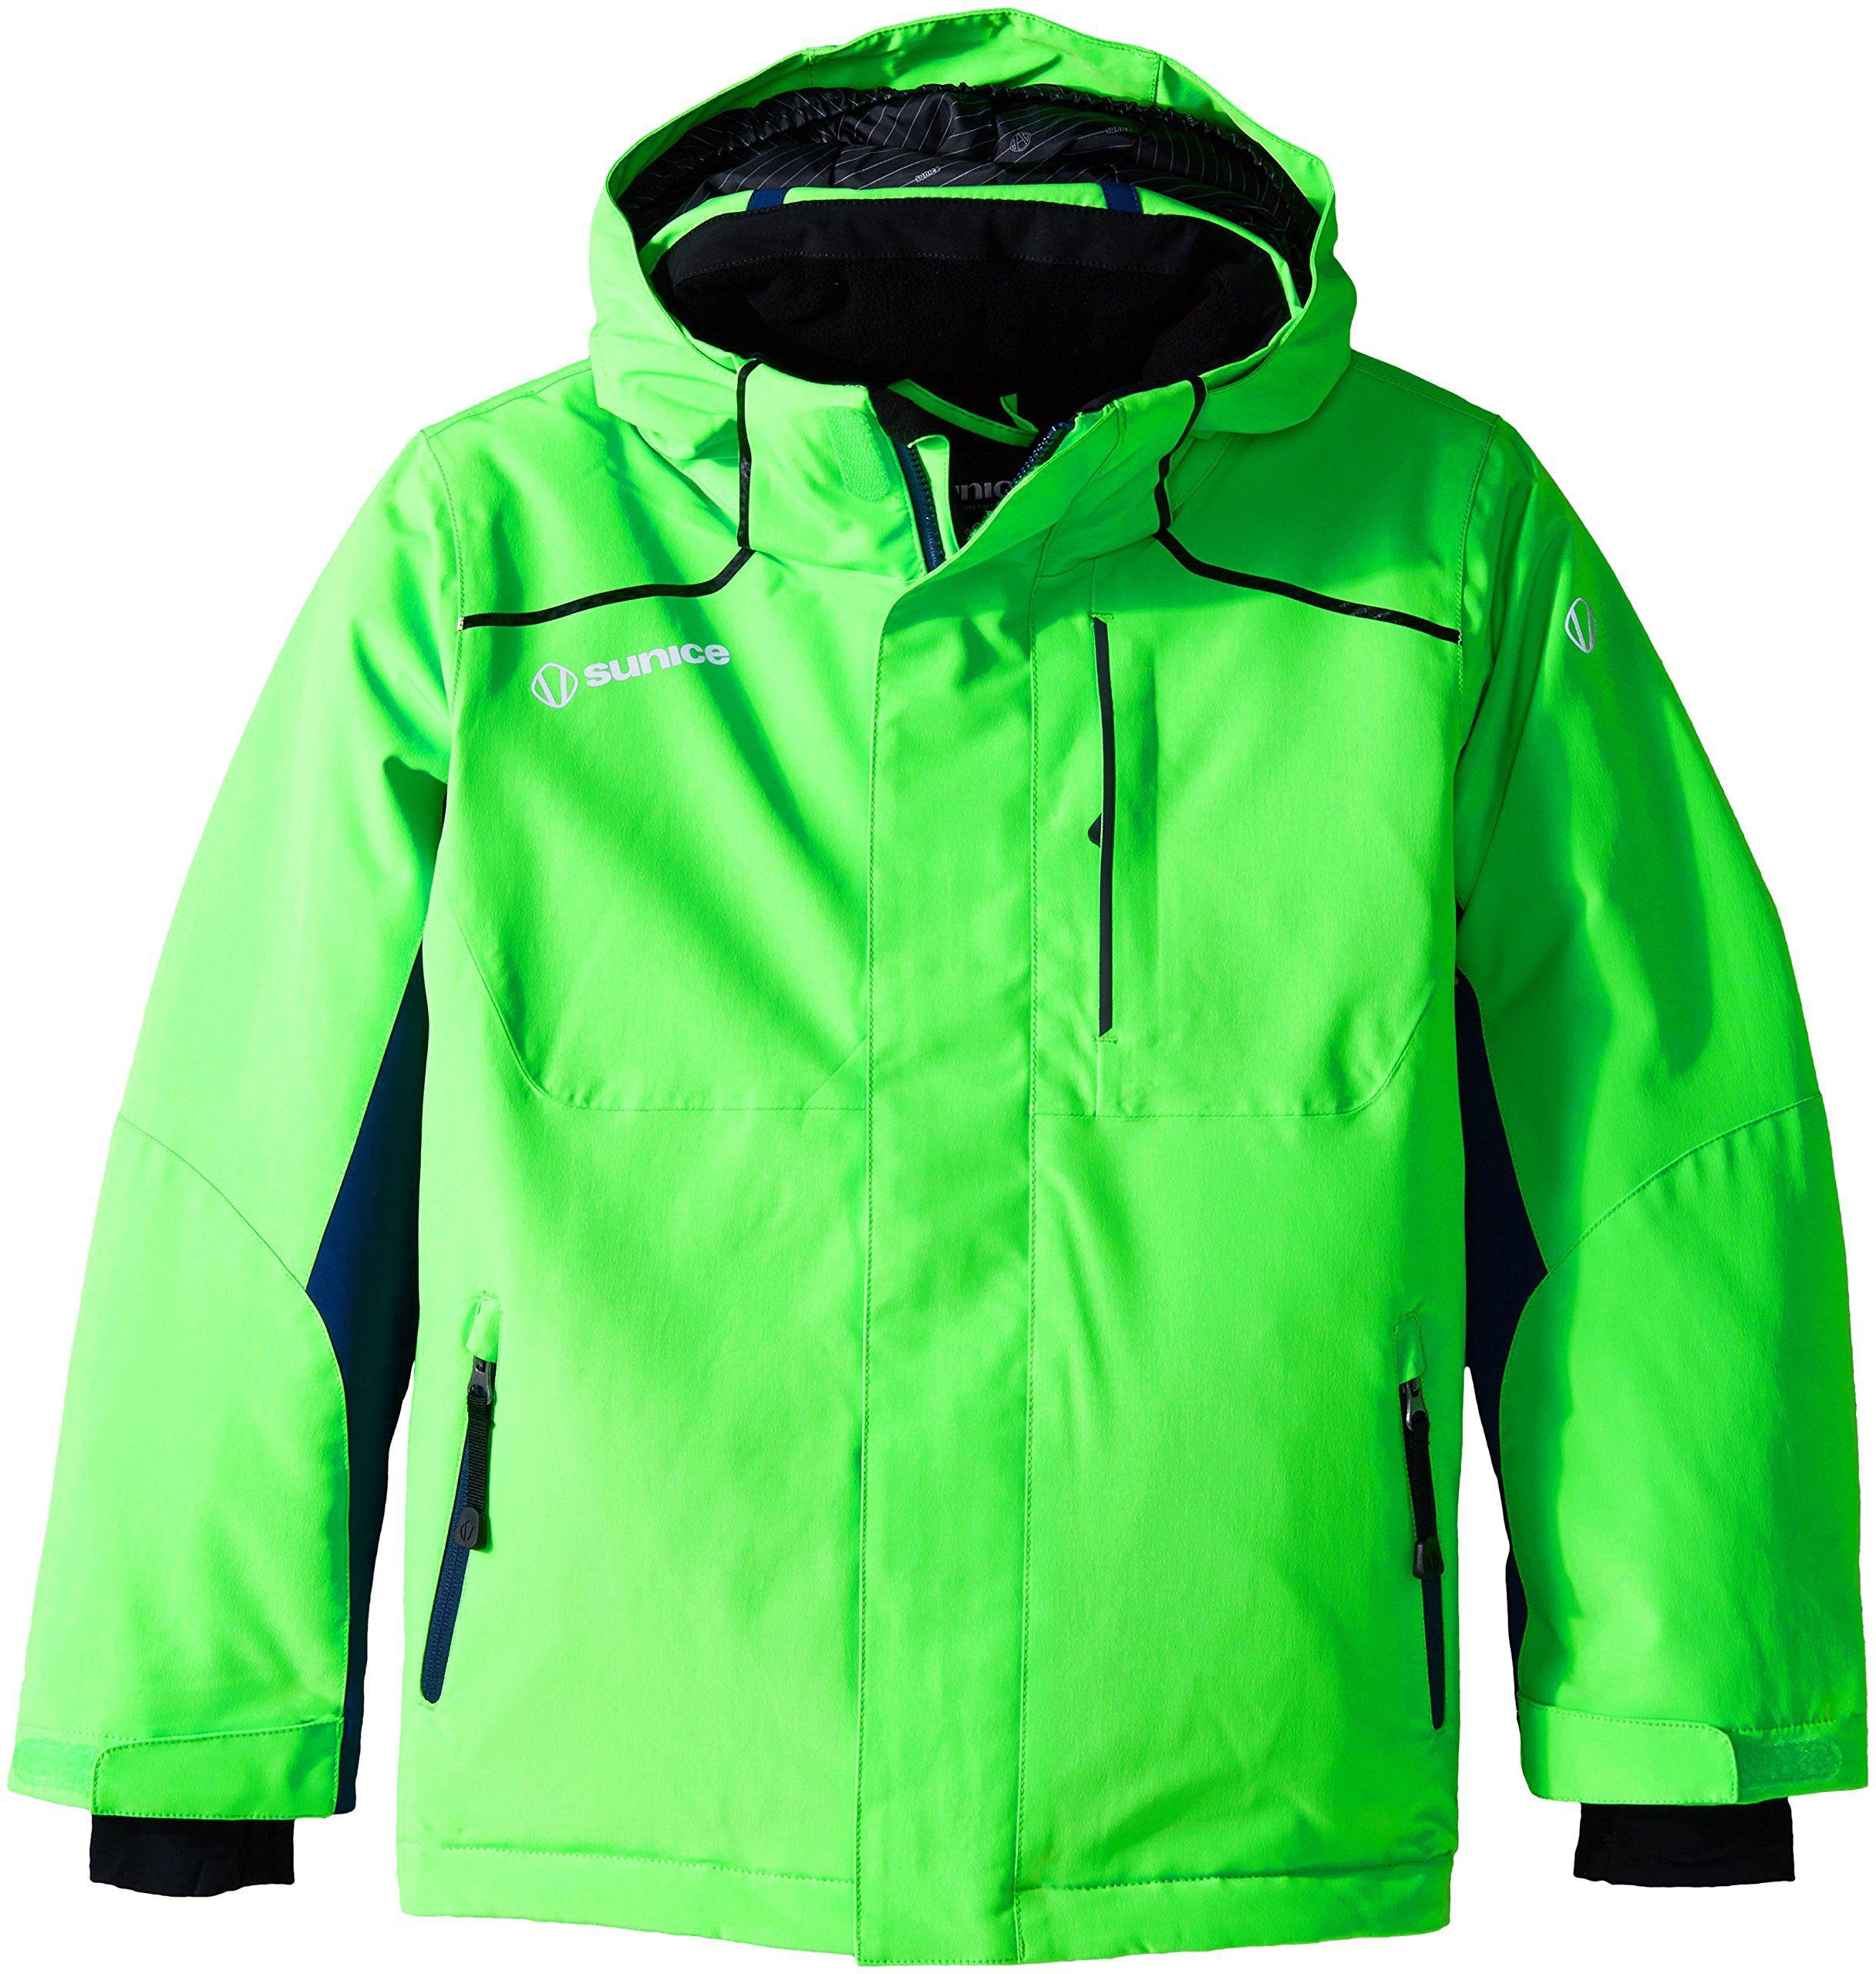 Sunice Boys Junior Volt Technical Jacket Flash Green Midnight 8 Snow Wrist Lycra Cuffs With Thumbhole To Help Ke Coats Jackets Women Jackets Athletic Jacket [ 2560 x 2433 Pixel ]